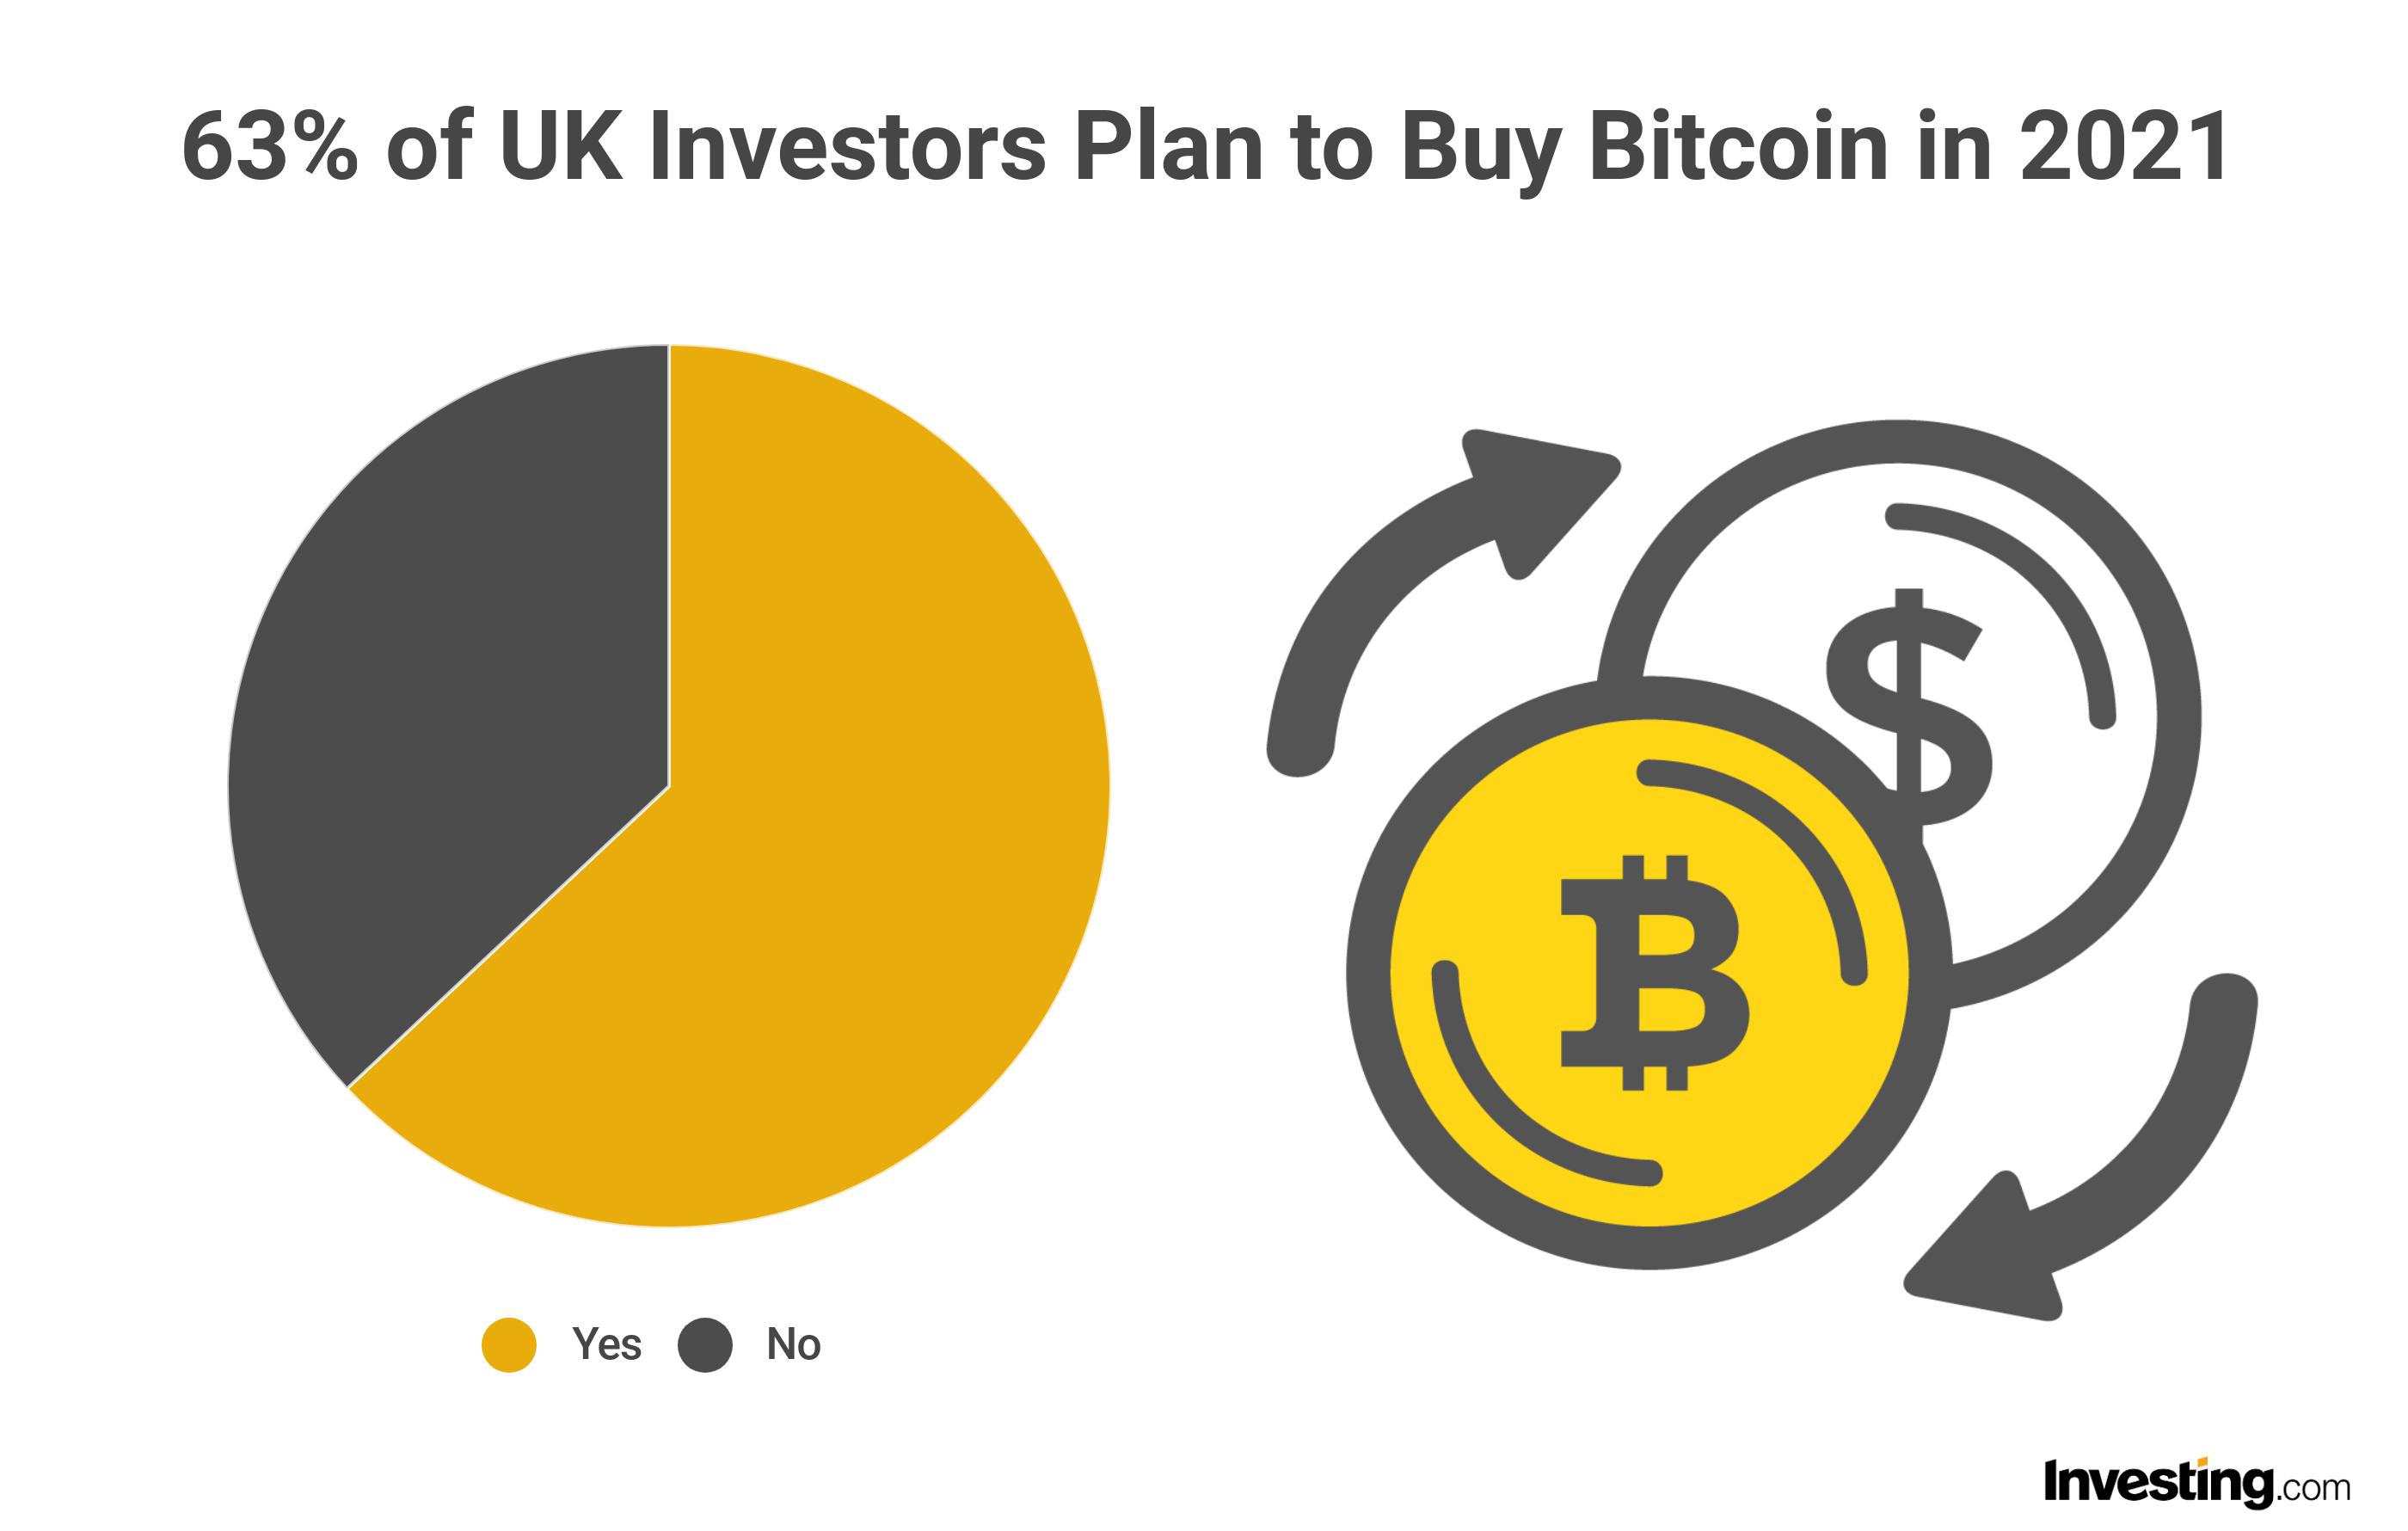 Investors entering Bitcoin in 2021